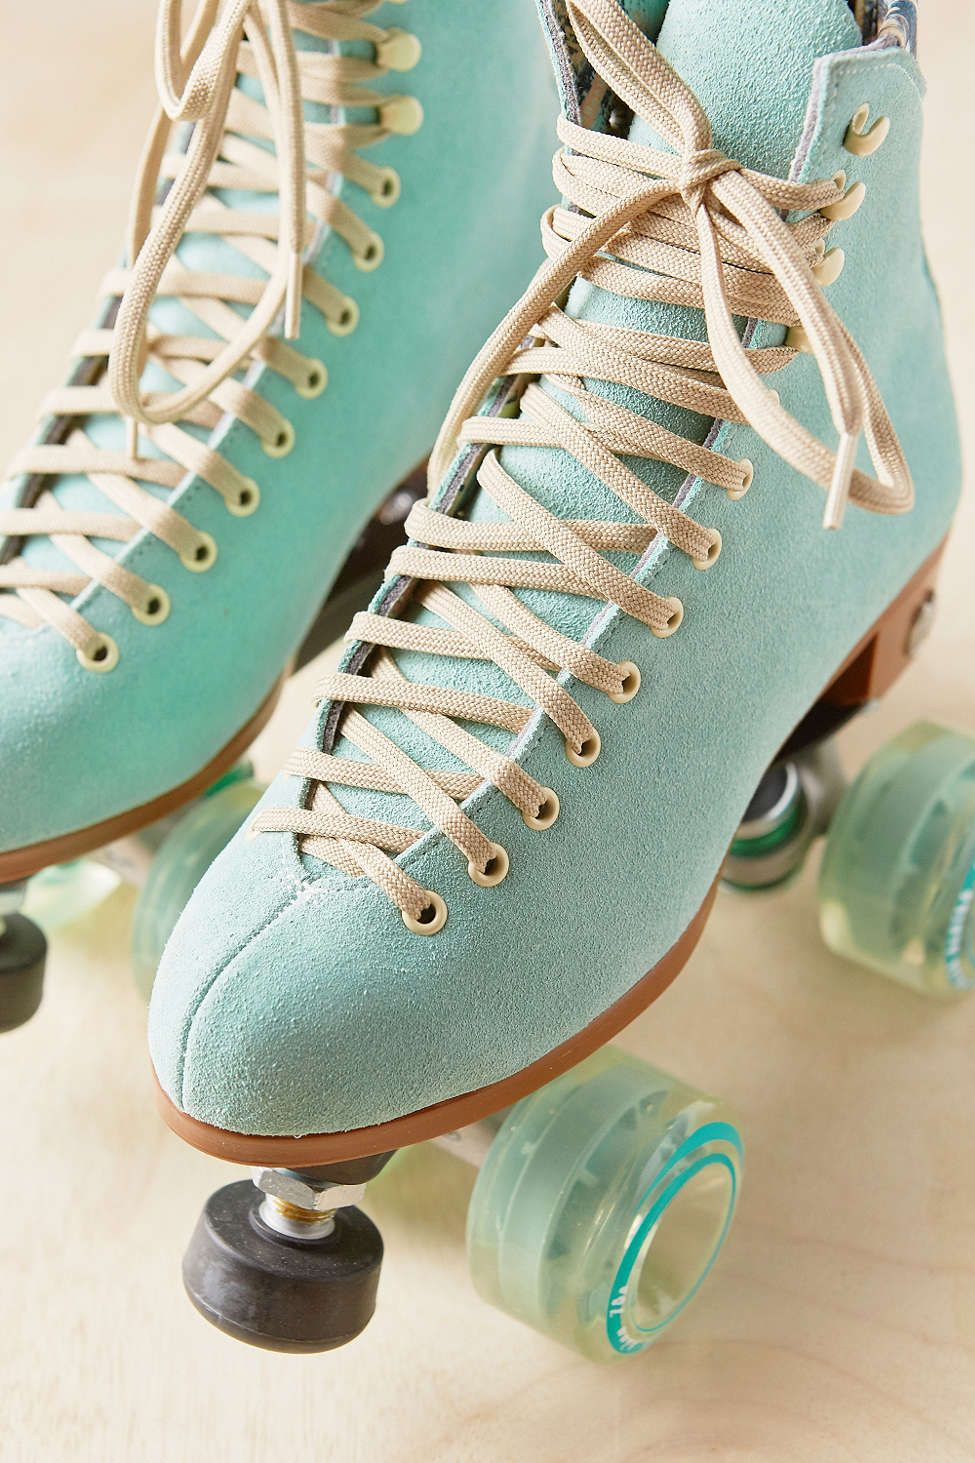 Roller shoes london - Moxi Lolly Roller Skates